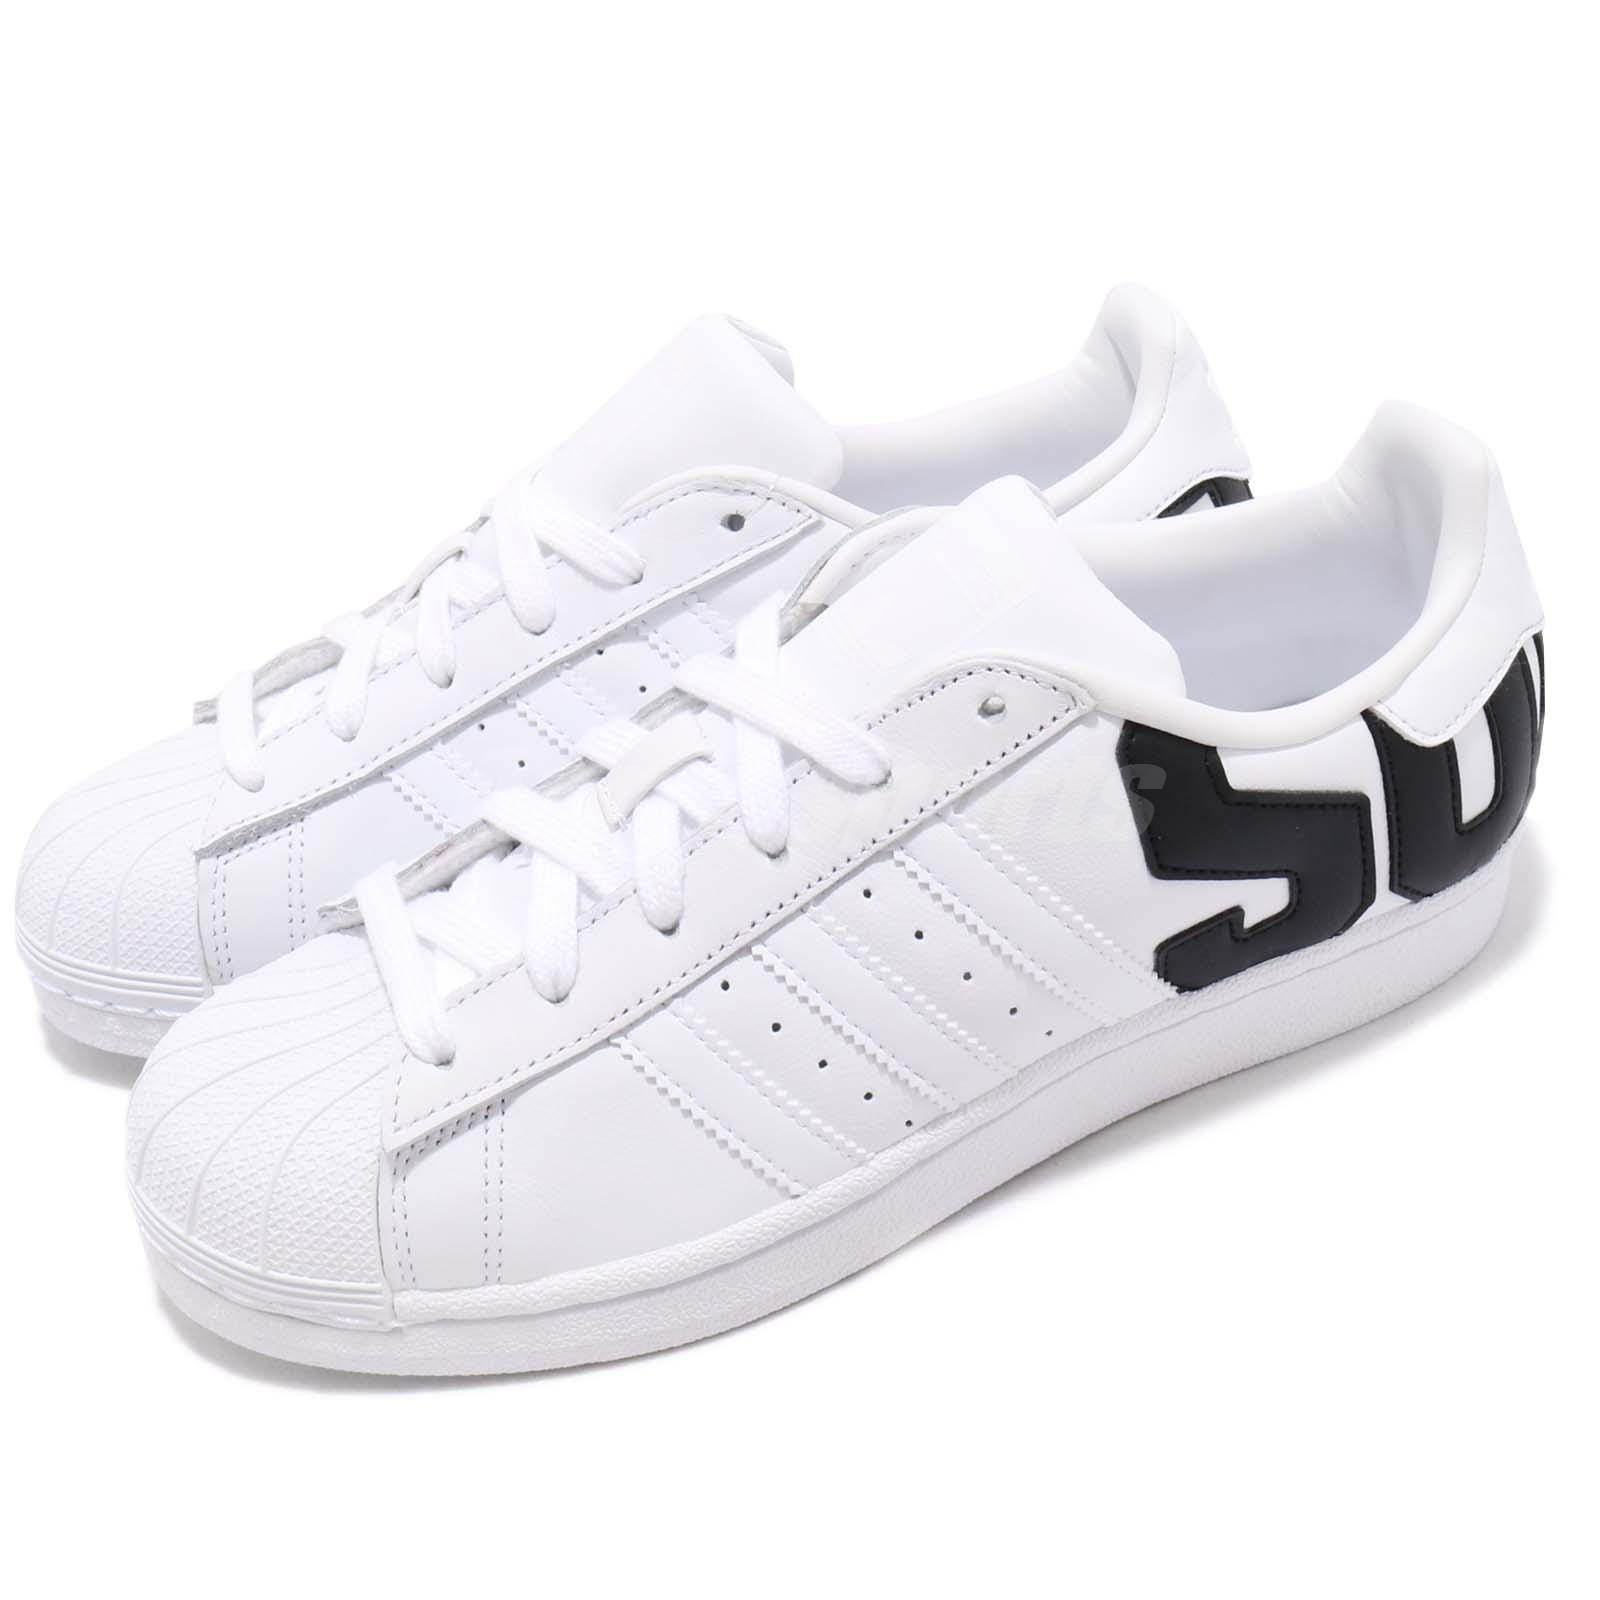 24f427f6fe24 Details about adidas Originals Superstar Big Logo White Black Men Women  Casual Shoes B37978